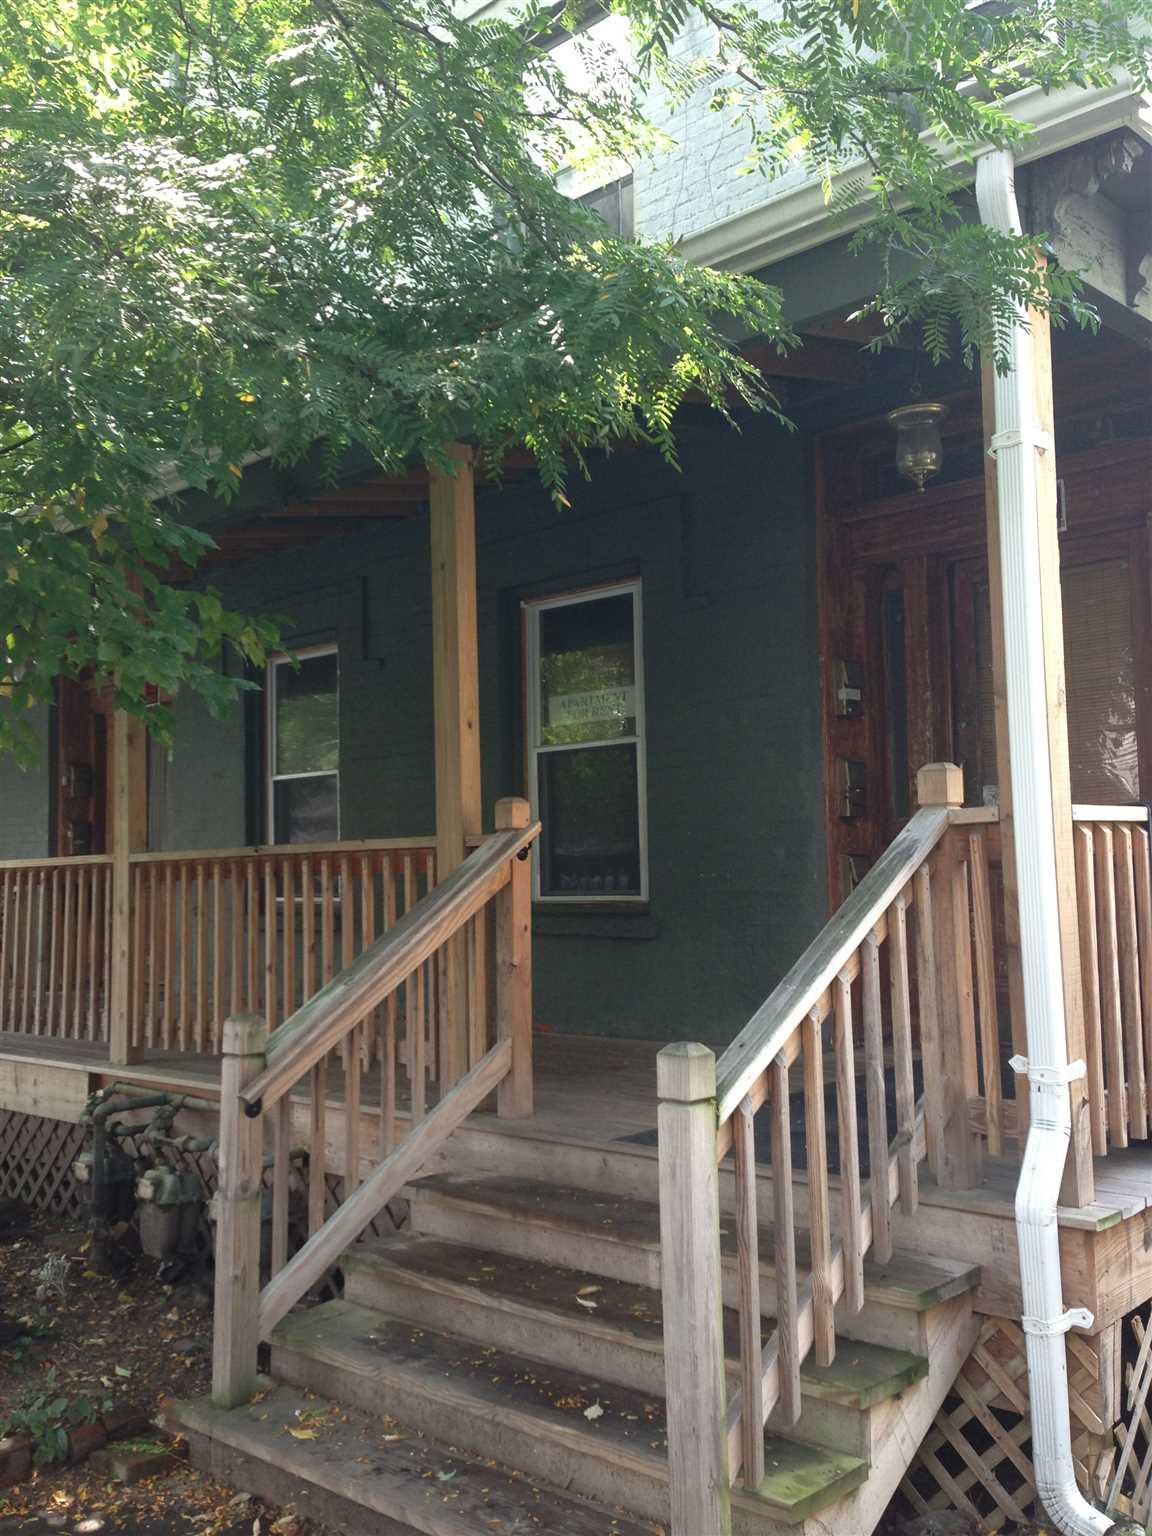 Single Family Home for Sale at 82 GARDEN Street 82 GARDEN Street Poughkeepsie, New York 12601 United States